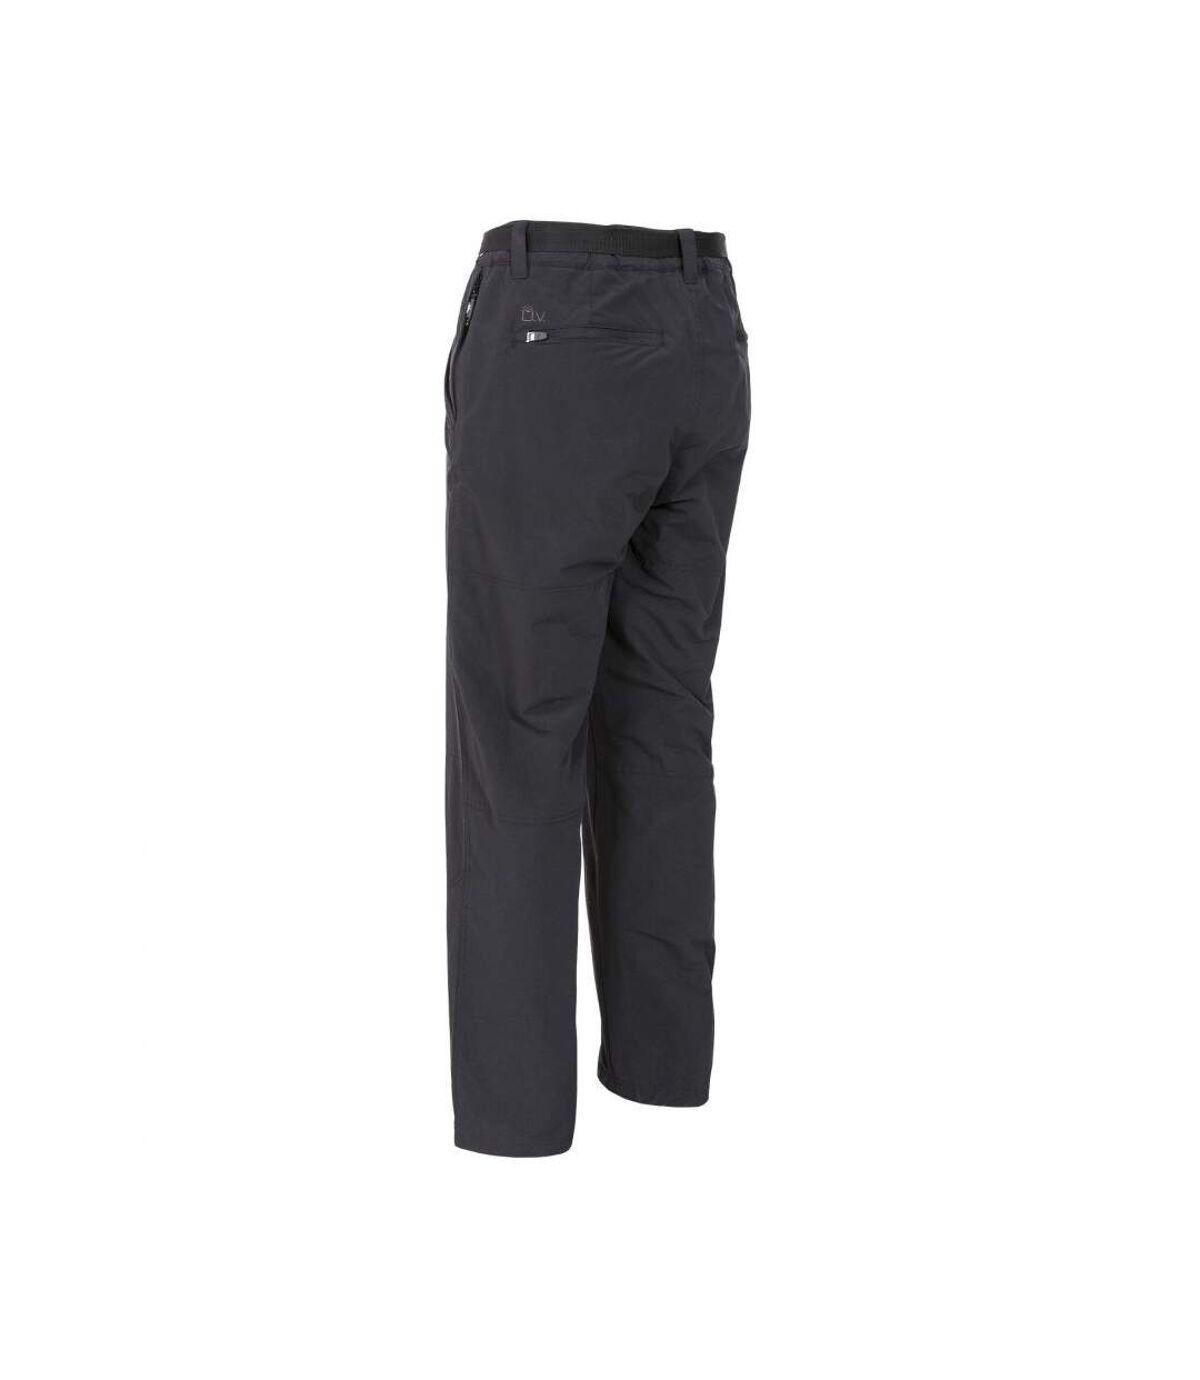 Trespass Mens Clifton All Season Waterproof Walking Trousers (Black) - UTTP3525